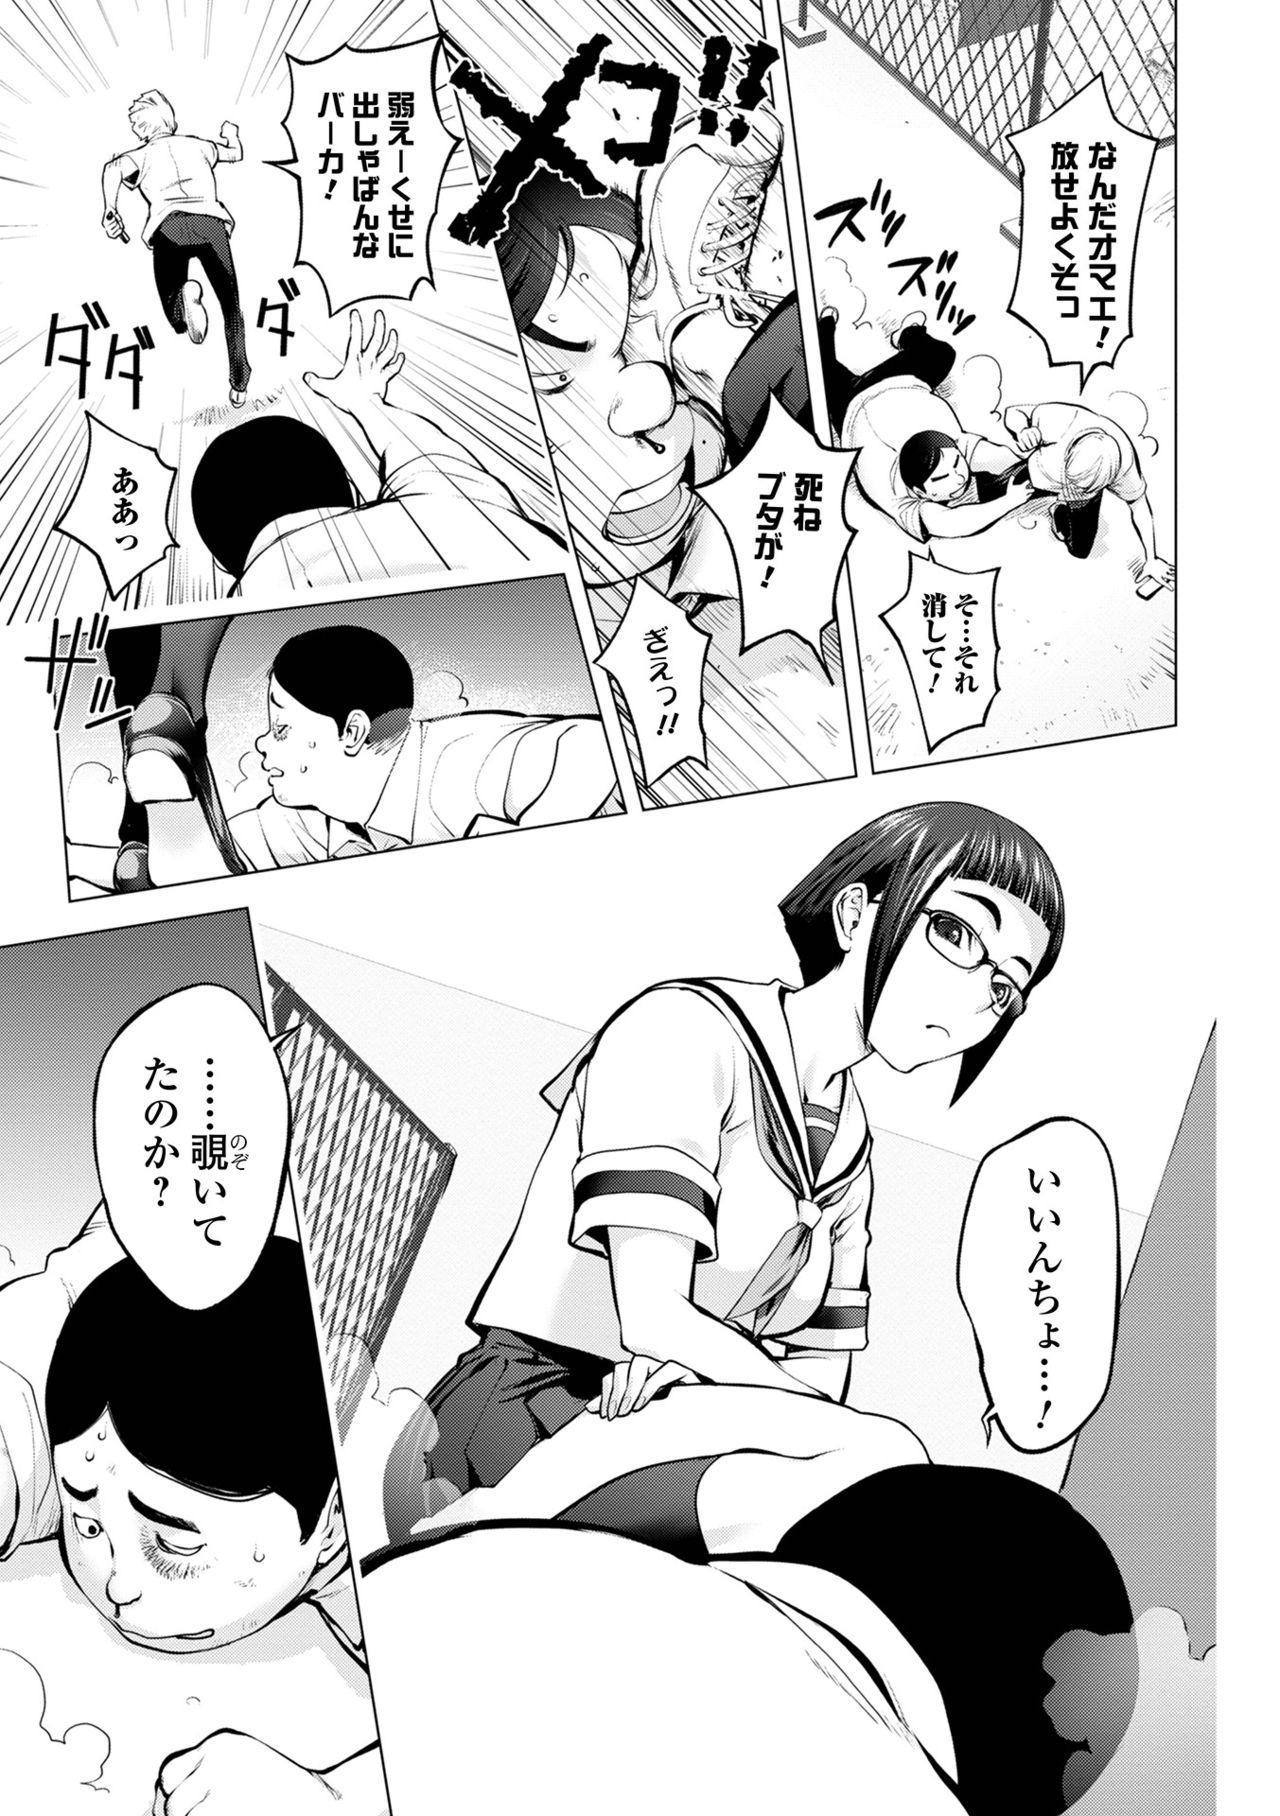 COMIC Shigekiteki SQUIRT!! Vol. 25 70